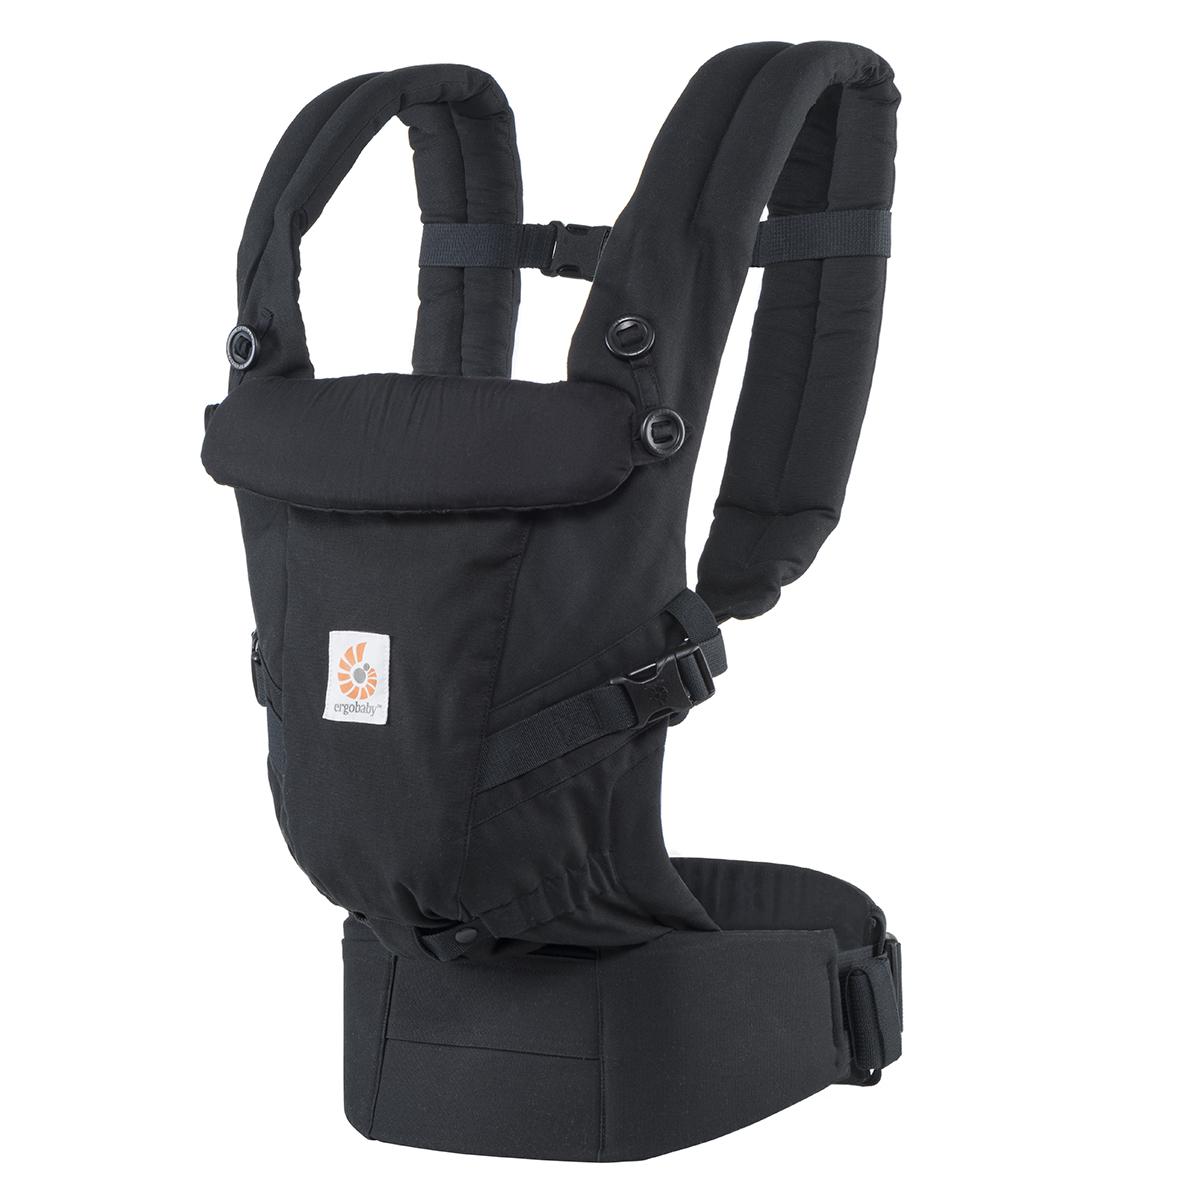 Porte bébé Porte-bébé Adapt - Noir Porte-bébé Adapt - Noir